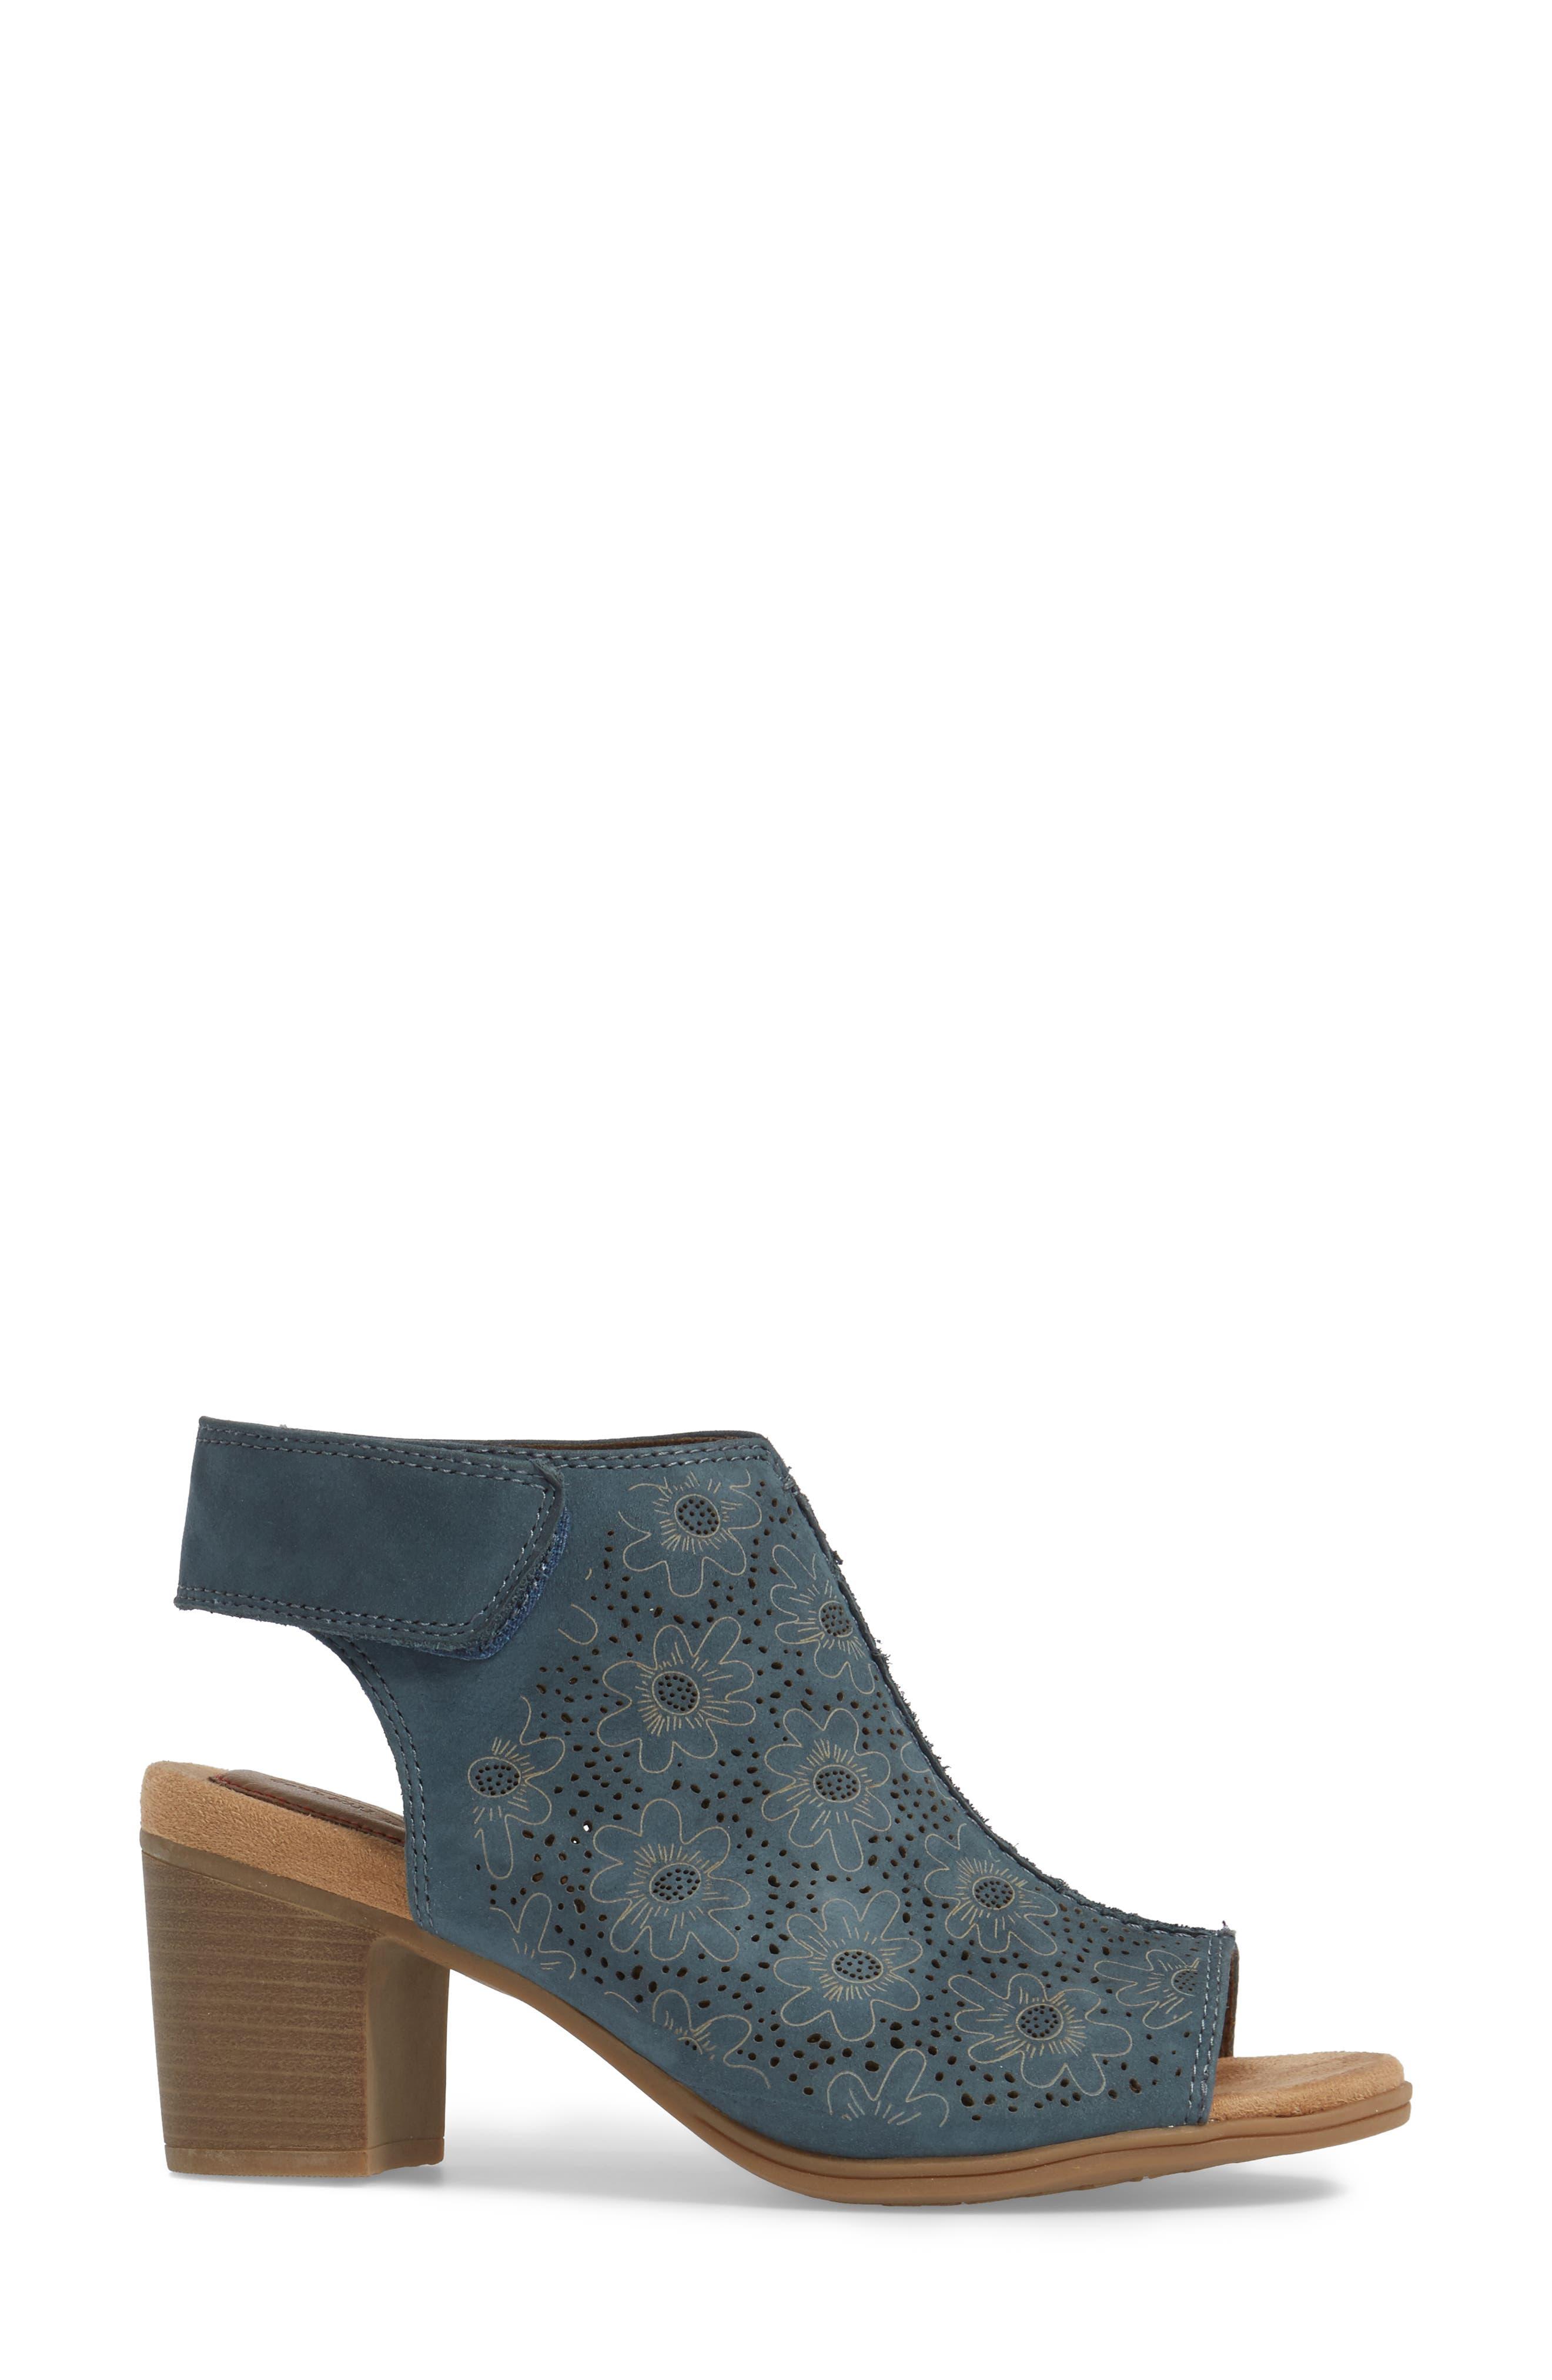 Alternate Image 3  - Rockport Cobb Hill Hattie Perforated Slingback Sandal (Women)